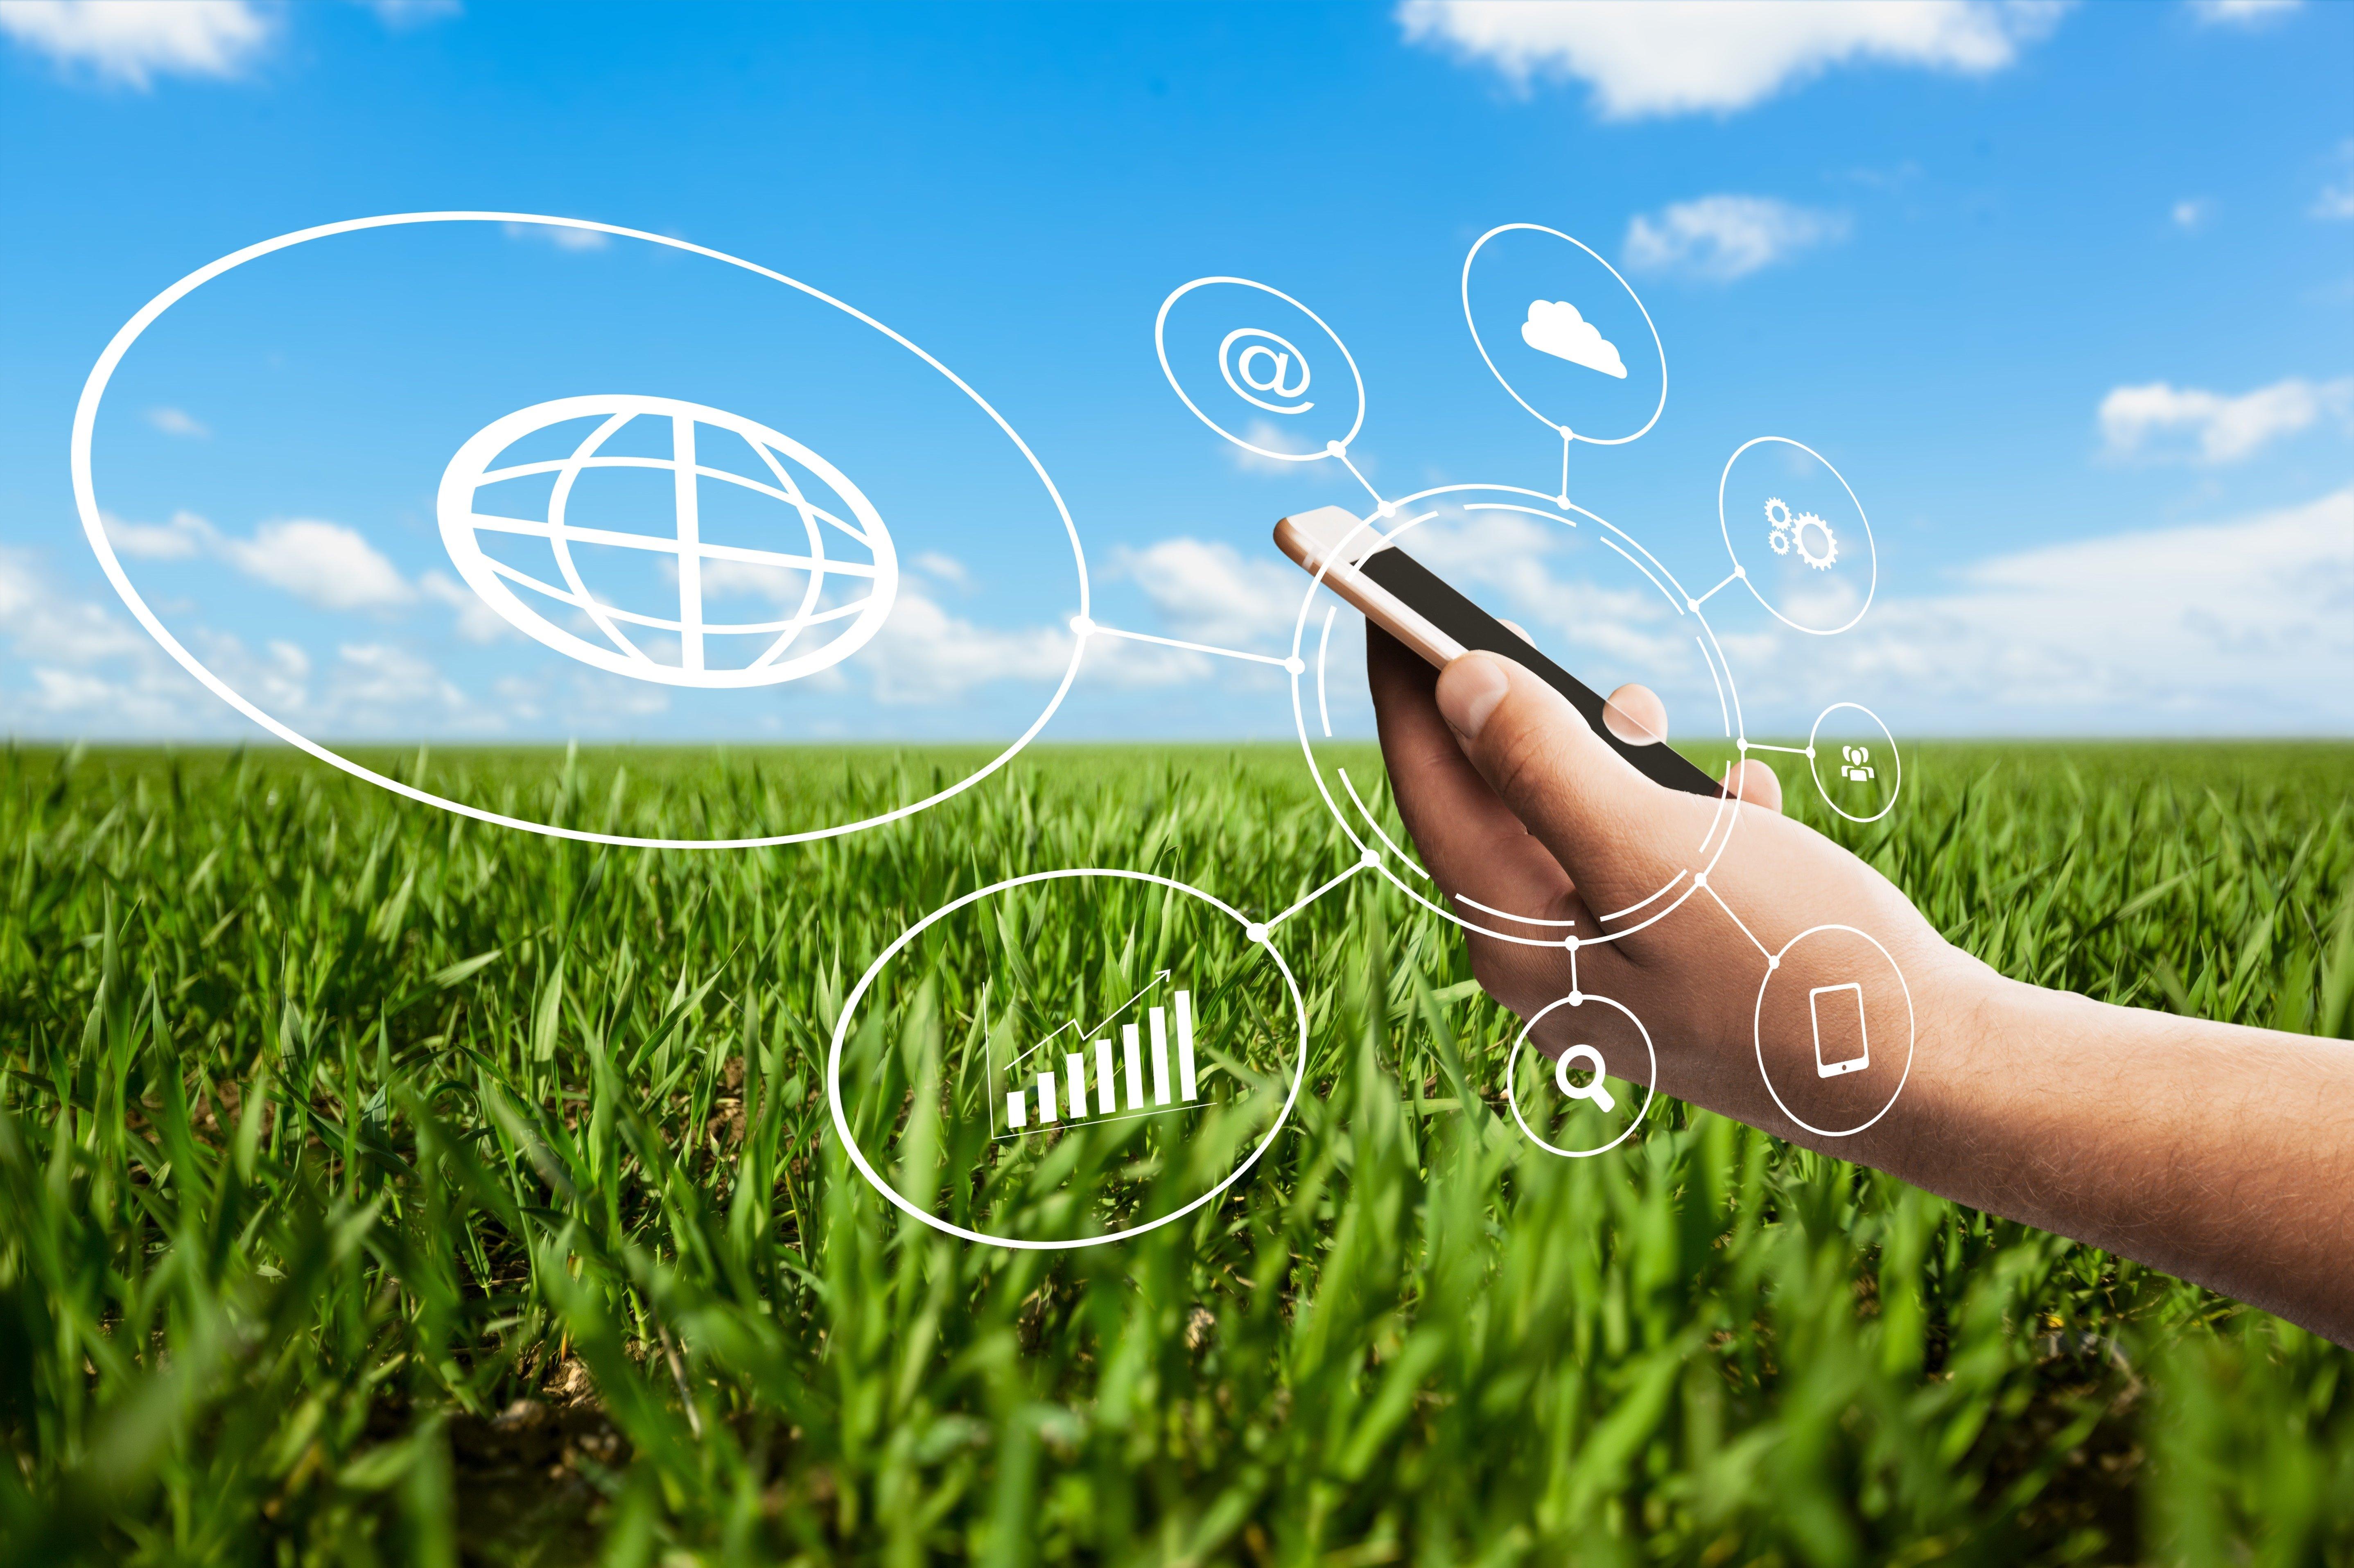 Cresce no país o mercado de softwares destinados ao gerenciamento da atividade agrícola